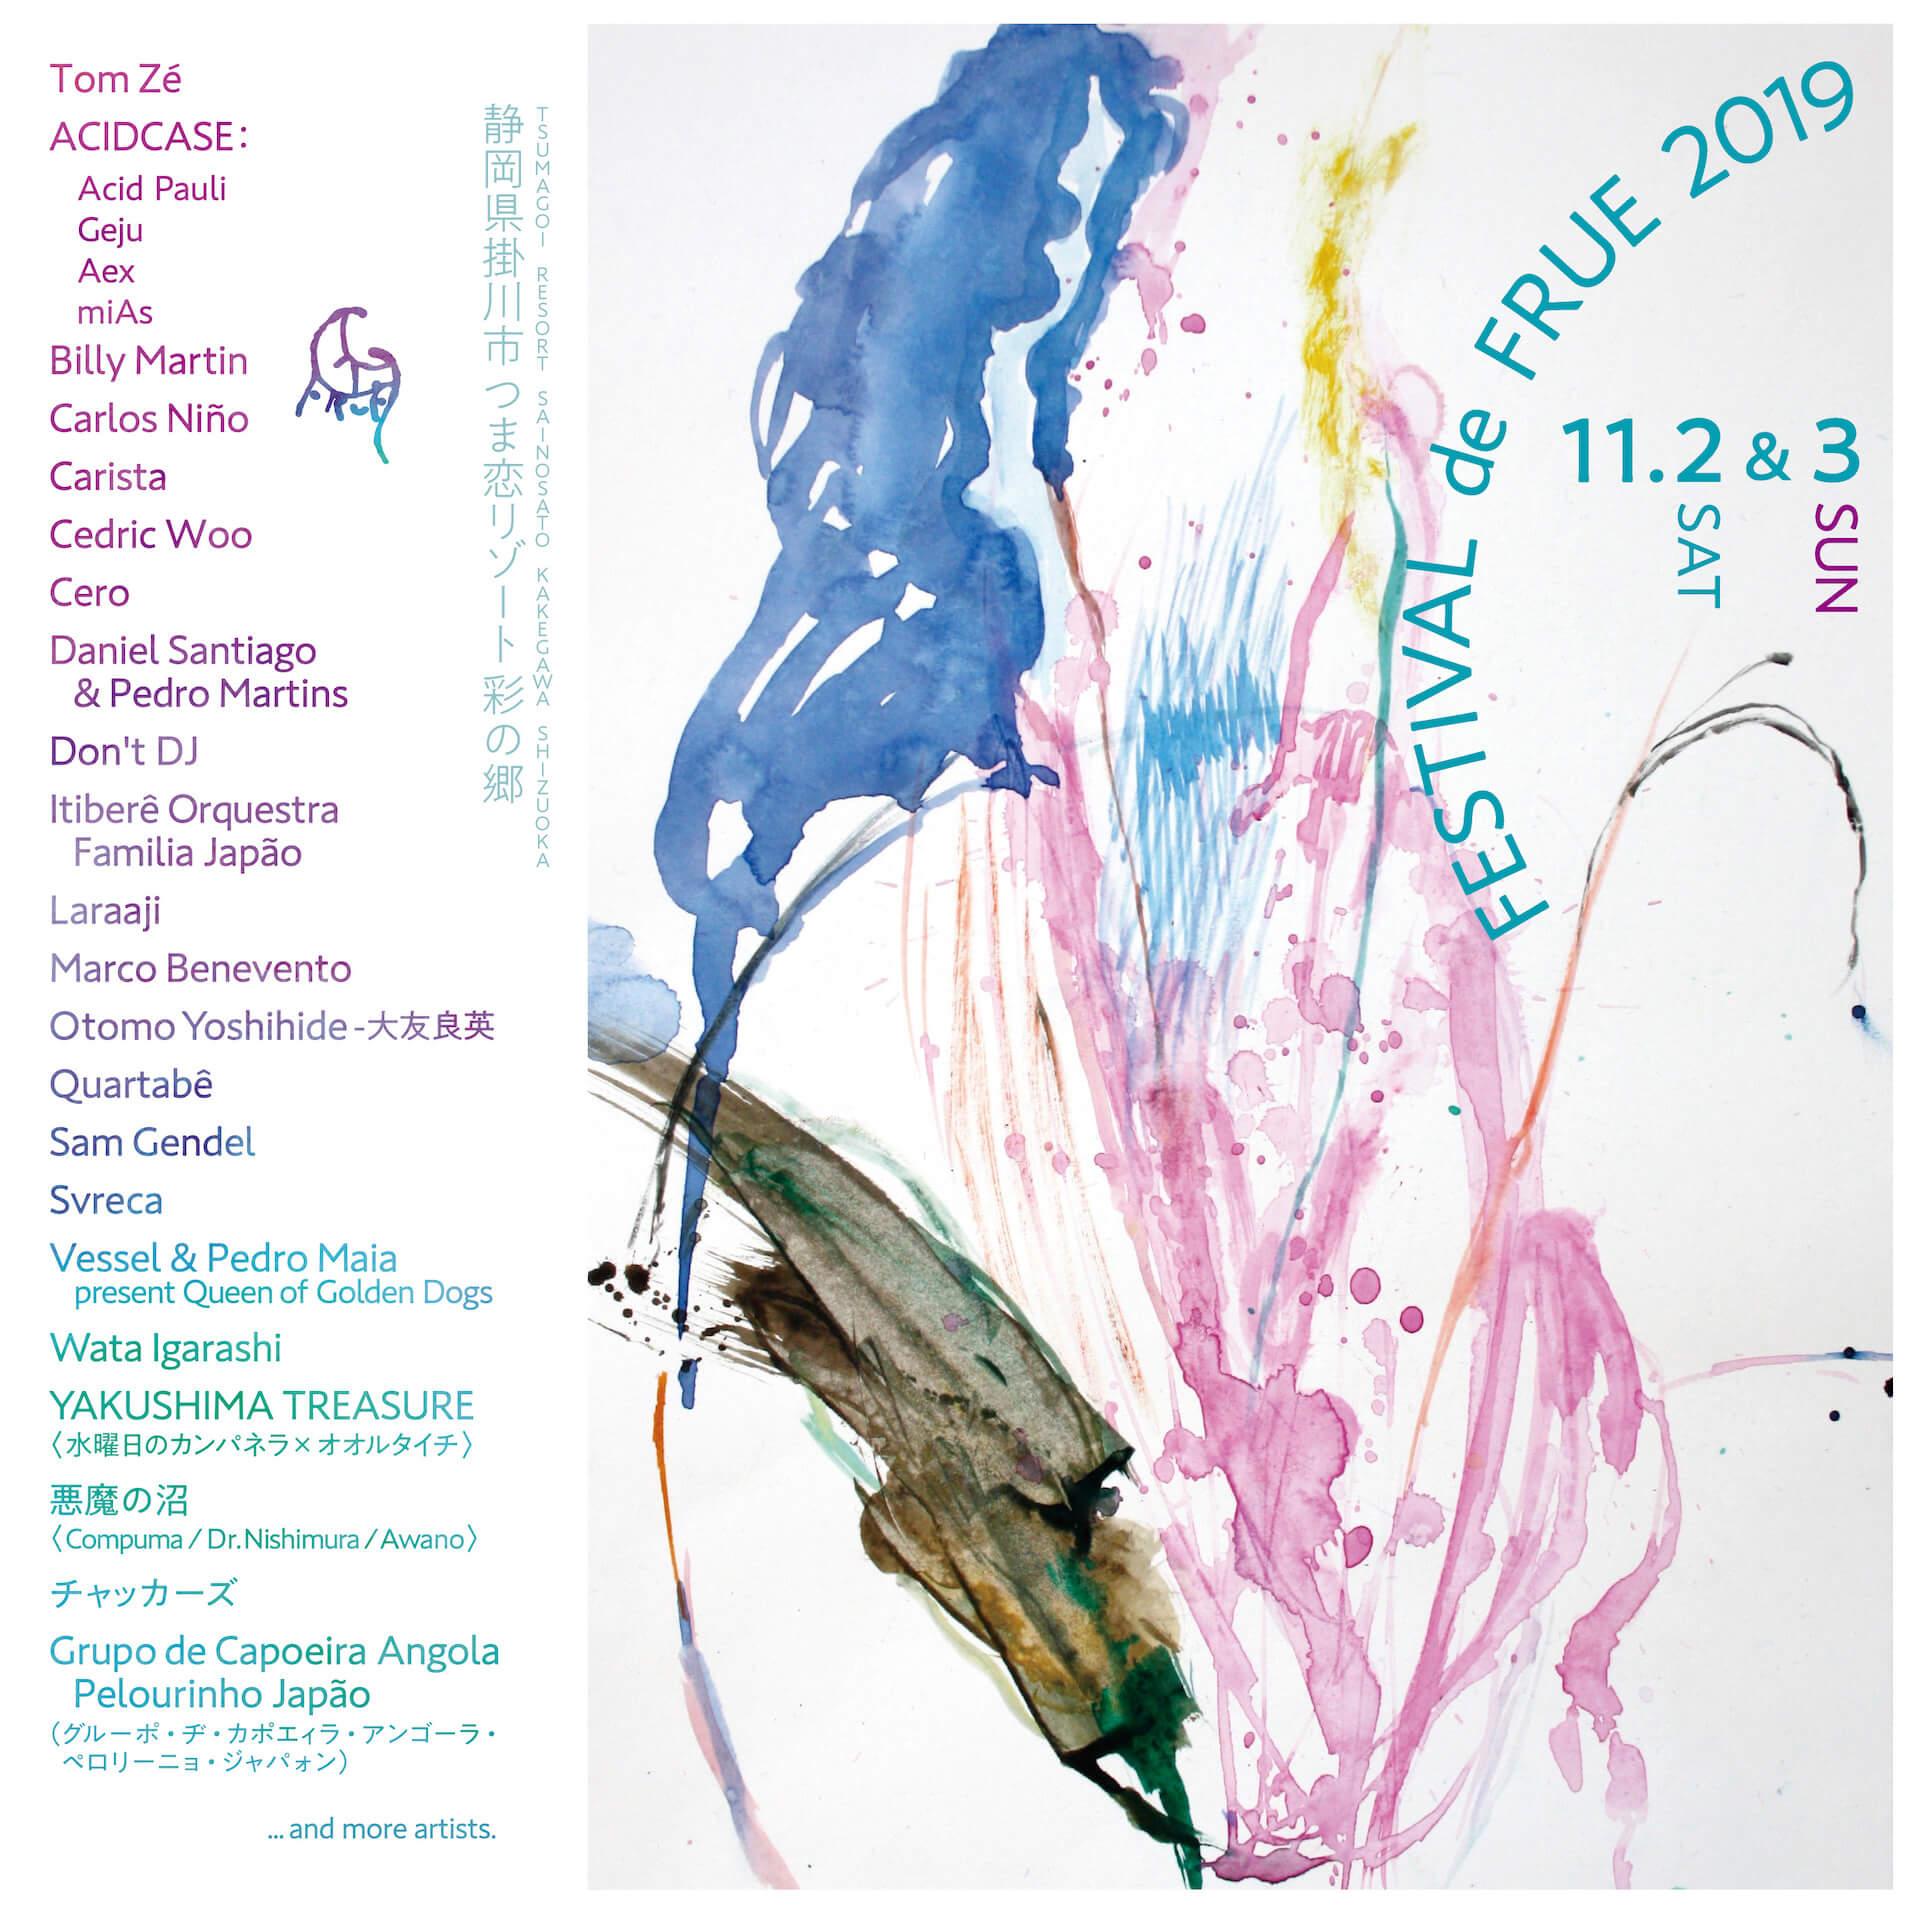 <FESTIVAL de FRUE>がつま恋リゾートで今年も開催|トン・ゼー、YAKUSHIMA TREASURE、ceroらが登場 music191023_festivaldefrue_01